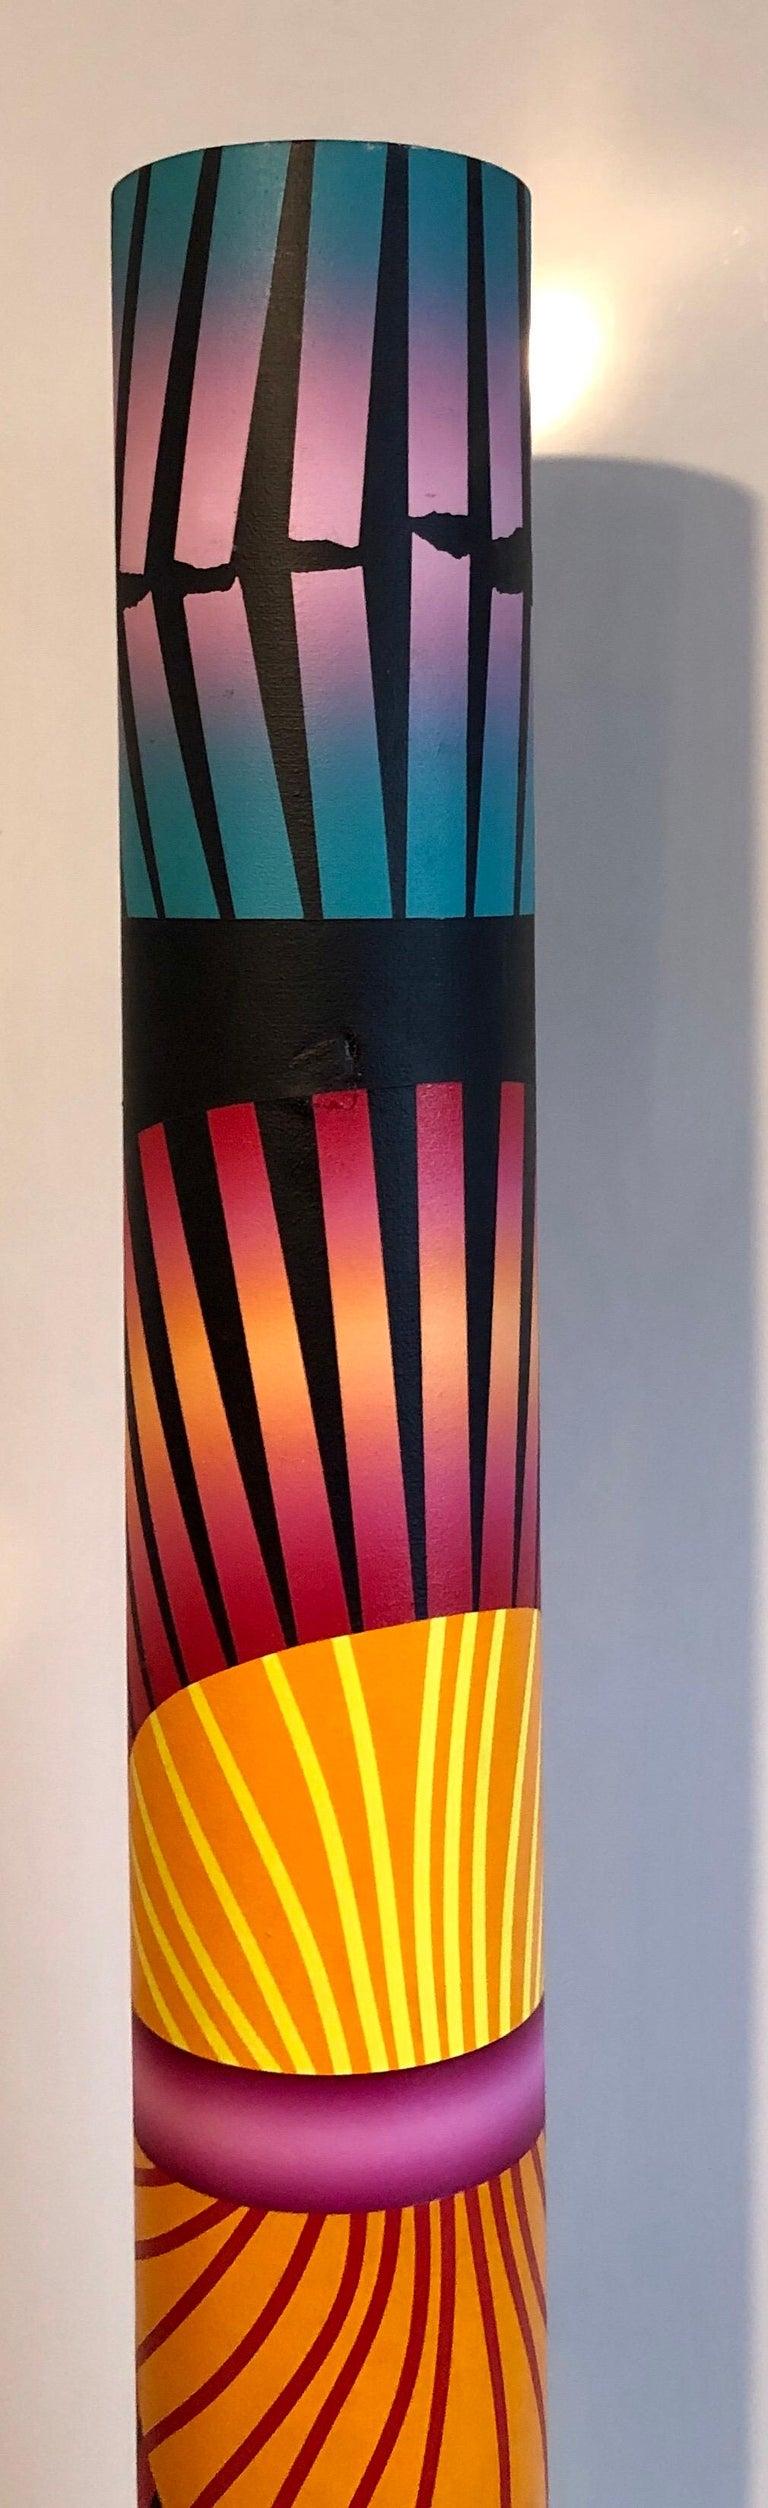 Abstract Geometric Shaped Canvas Painting Sculpture Memphis Milano Era 1980s Art 8